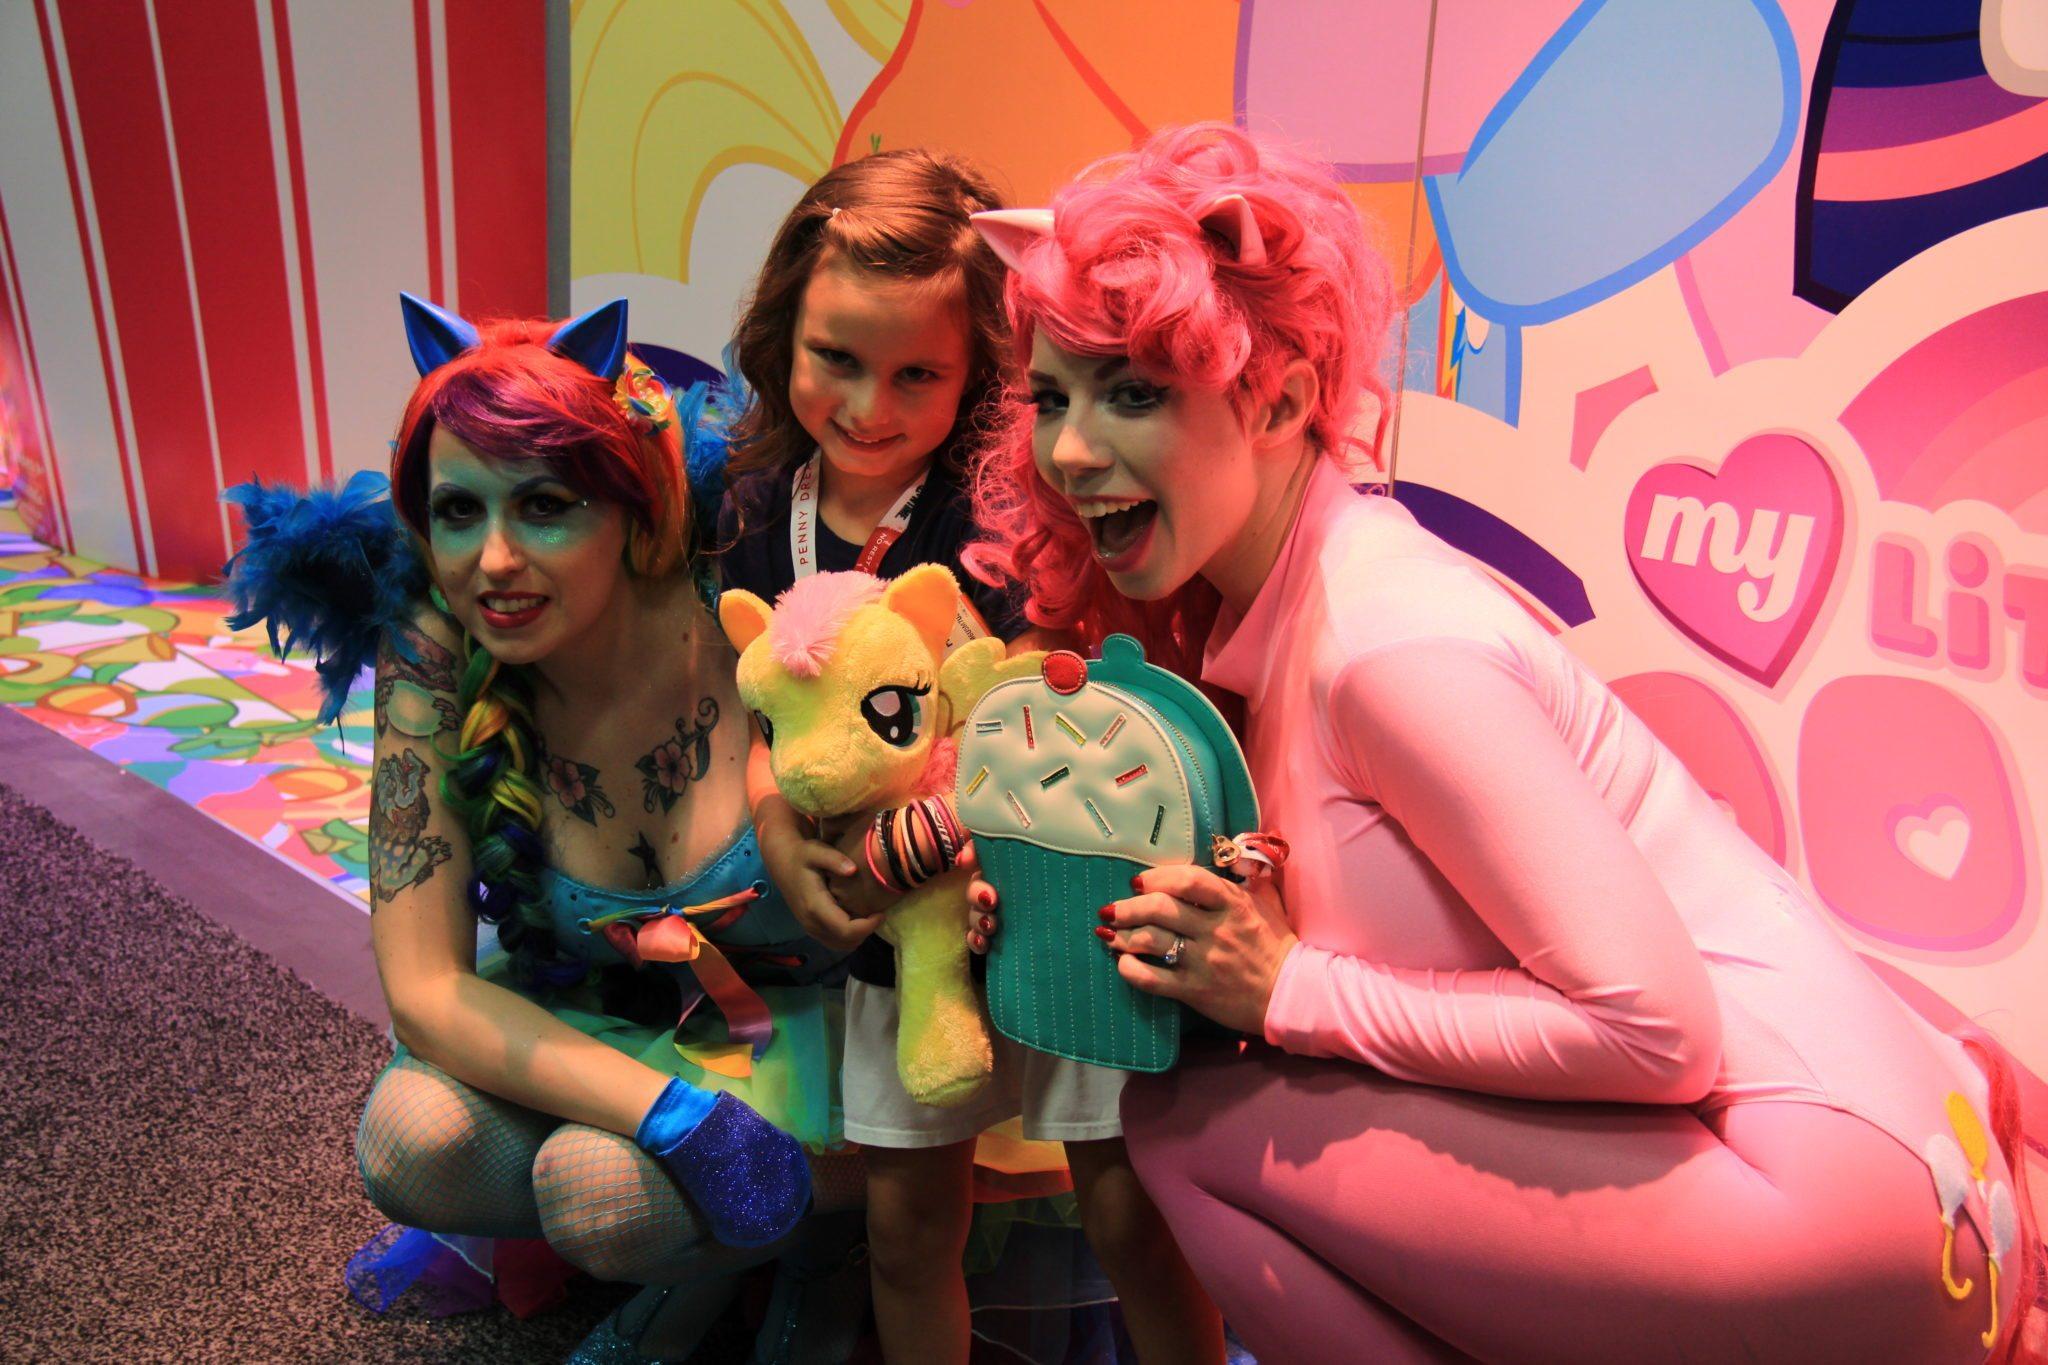 San Diego Comic Con 2015 - Cosplayers 4